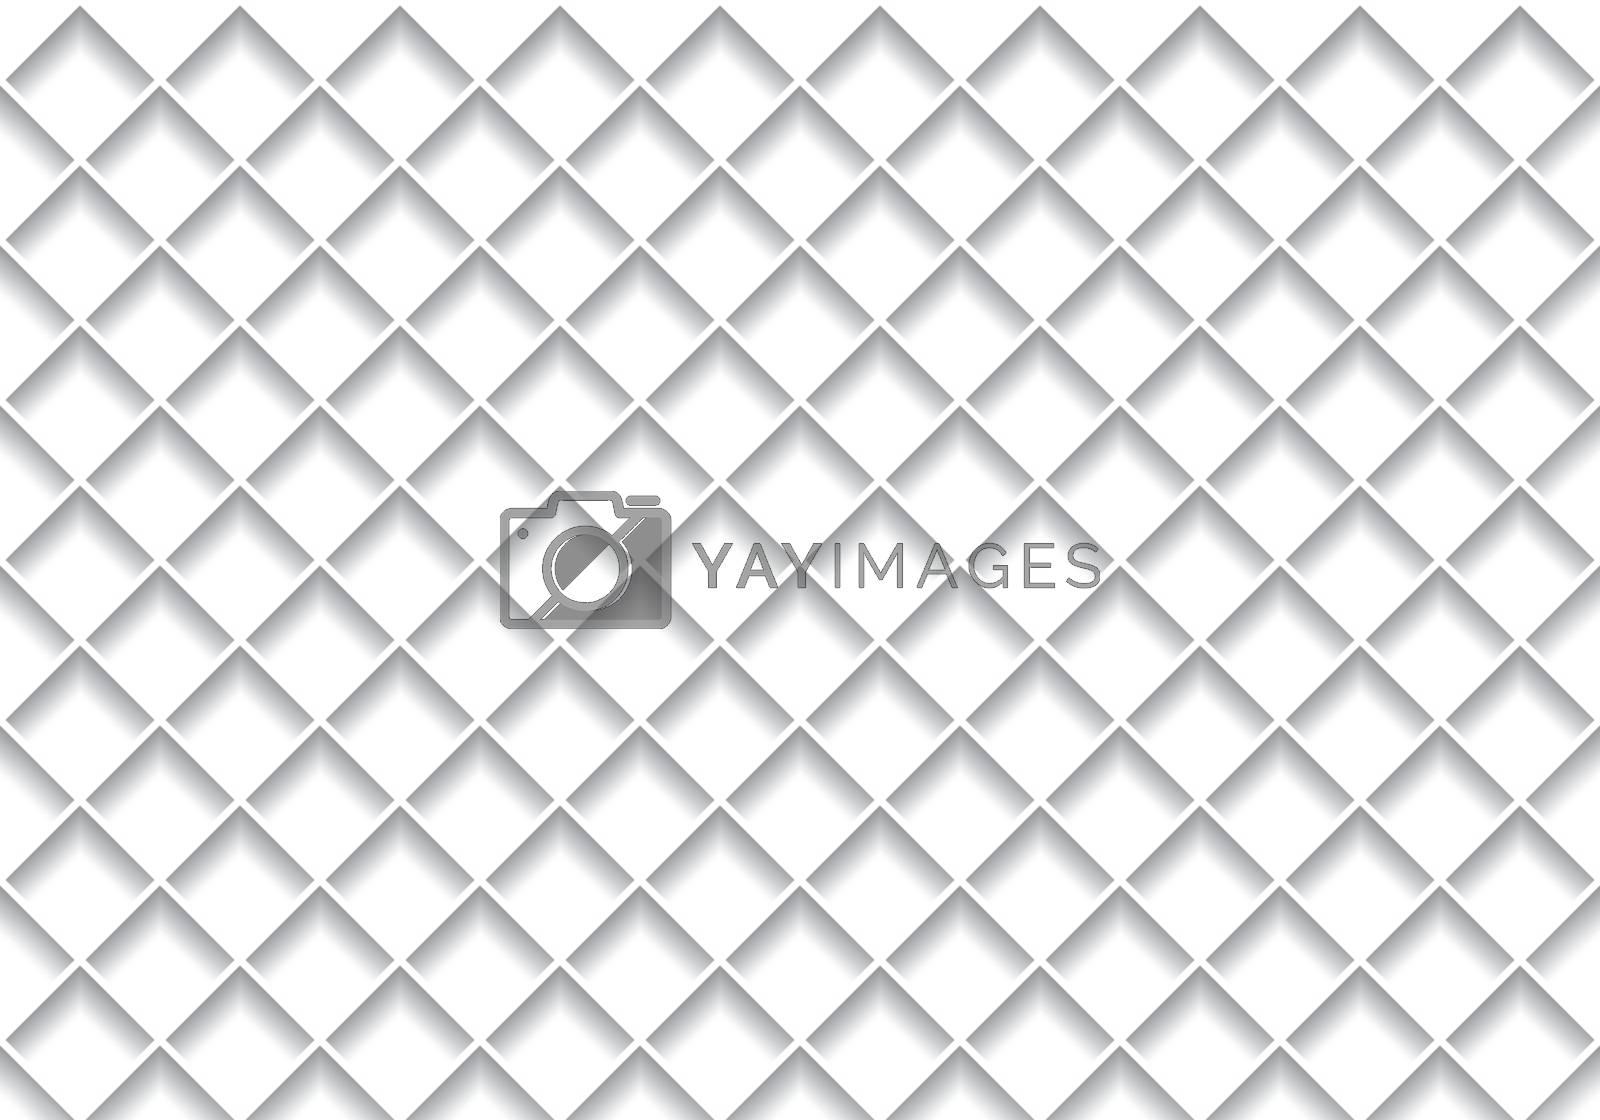 White Grid Texture - Background Illustration, Vector